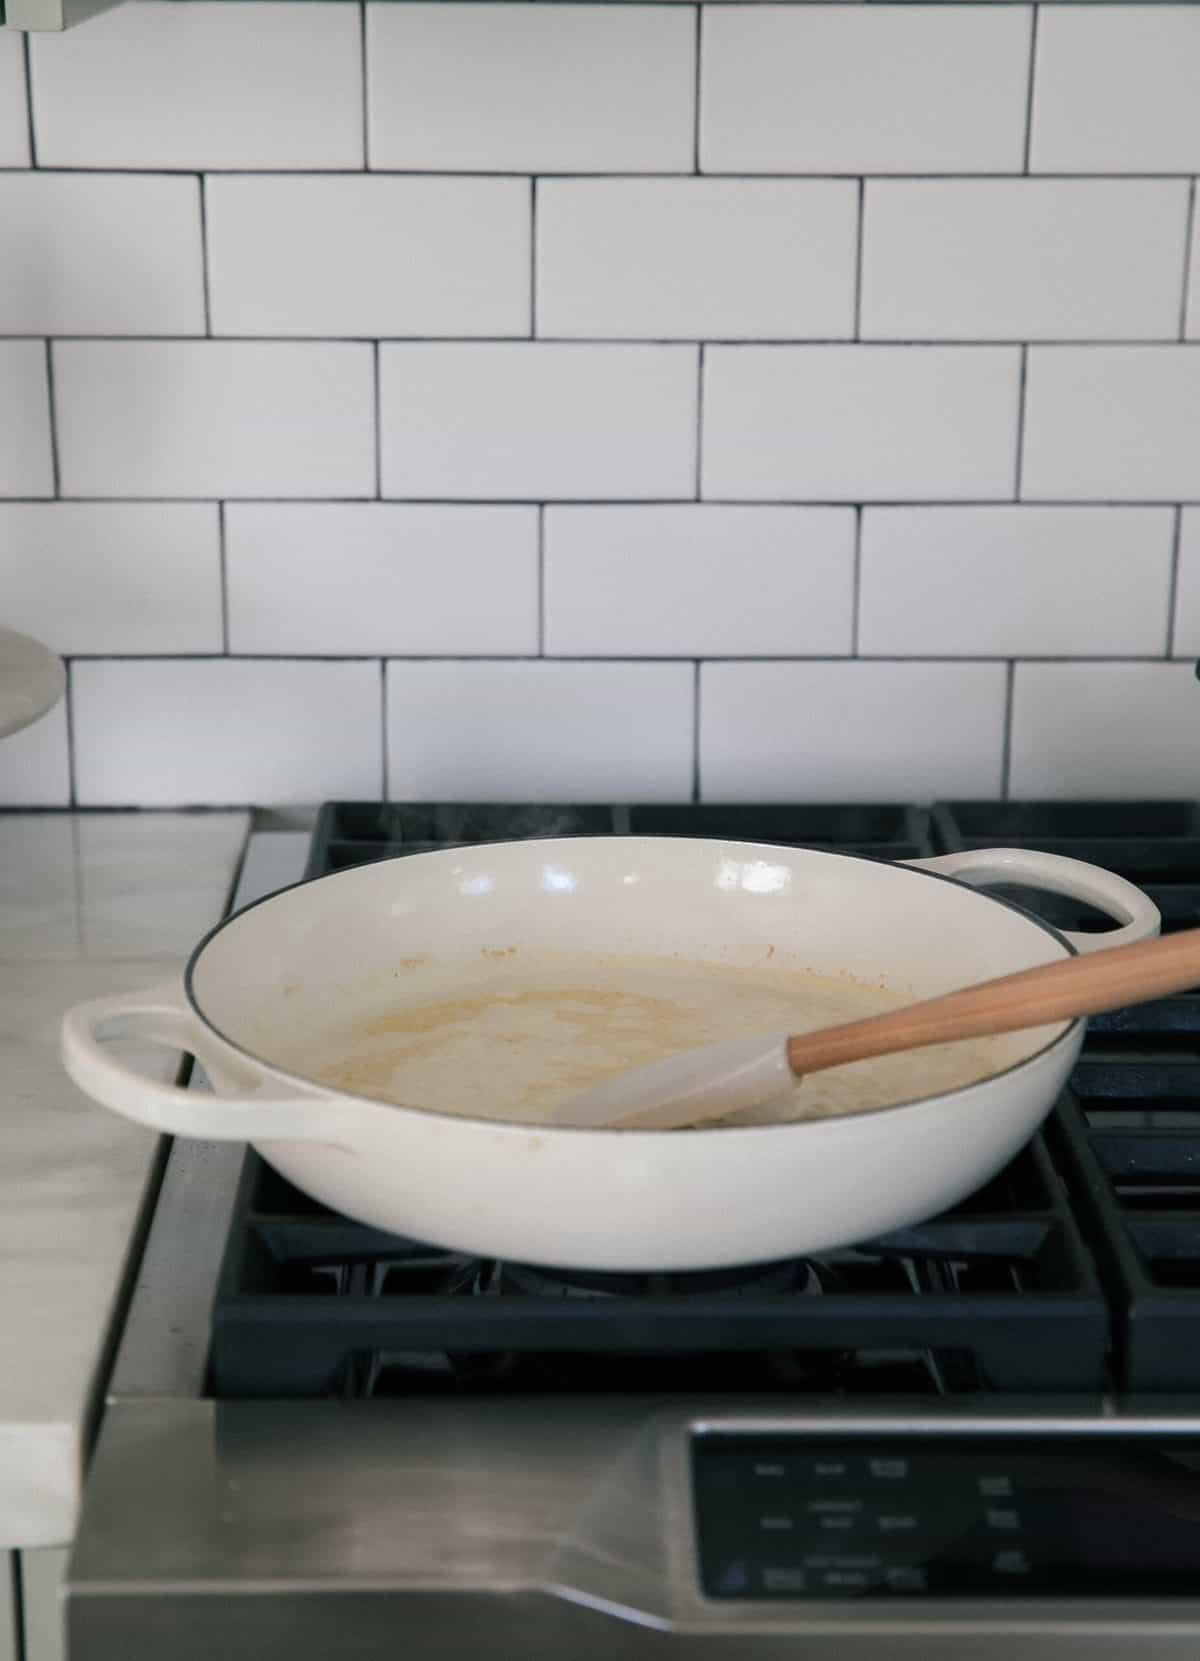 Cream sauce cooking